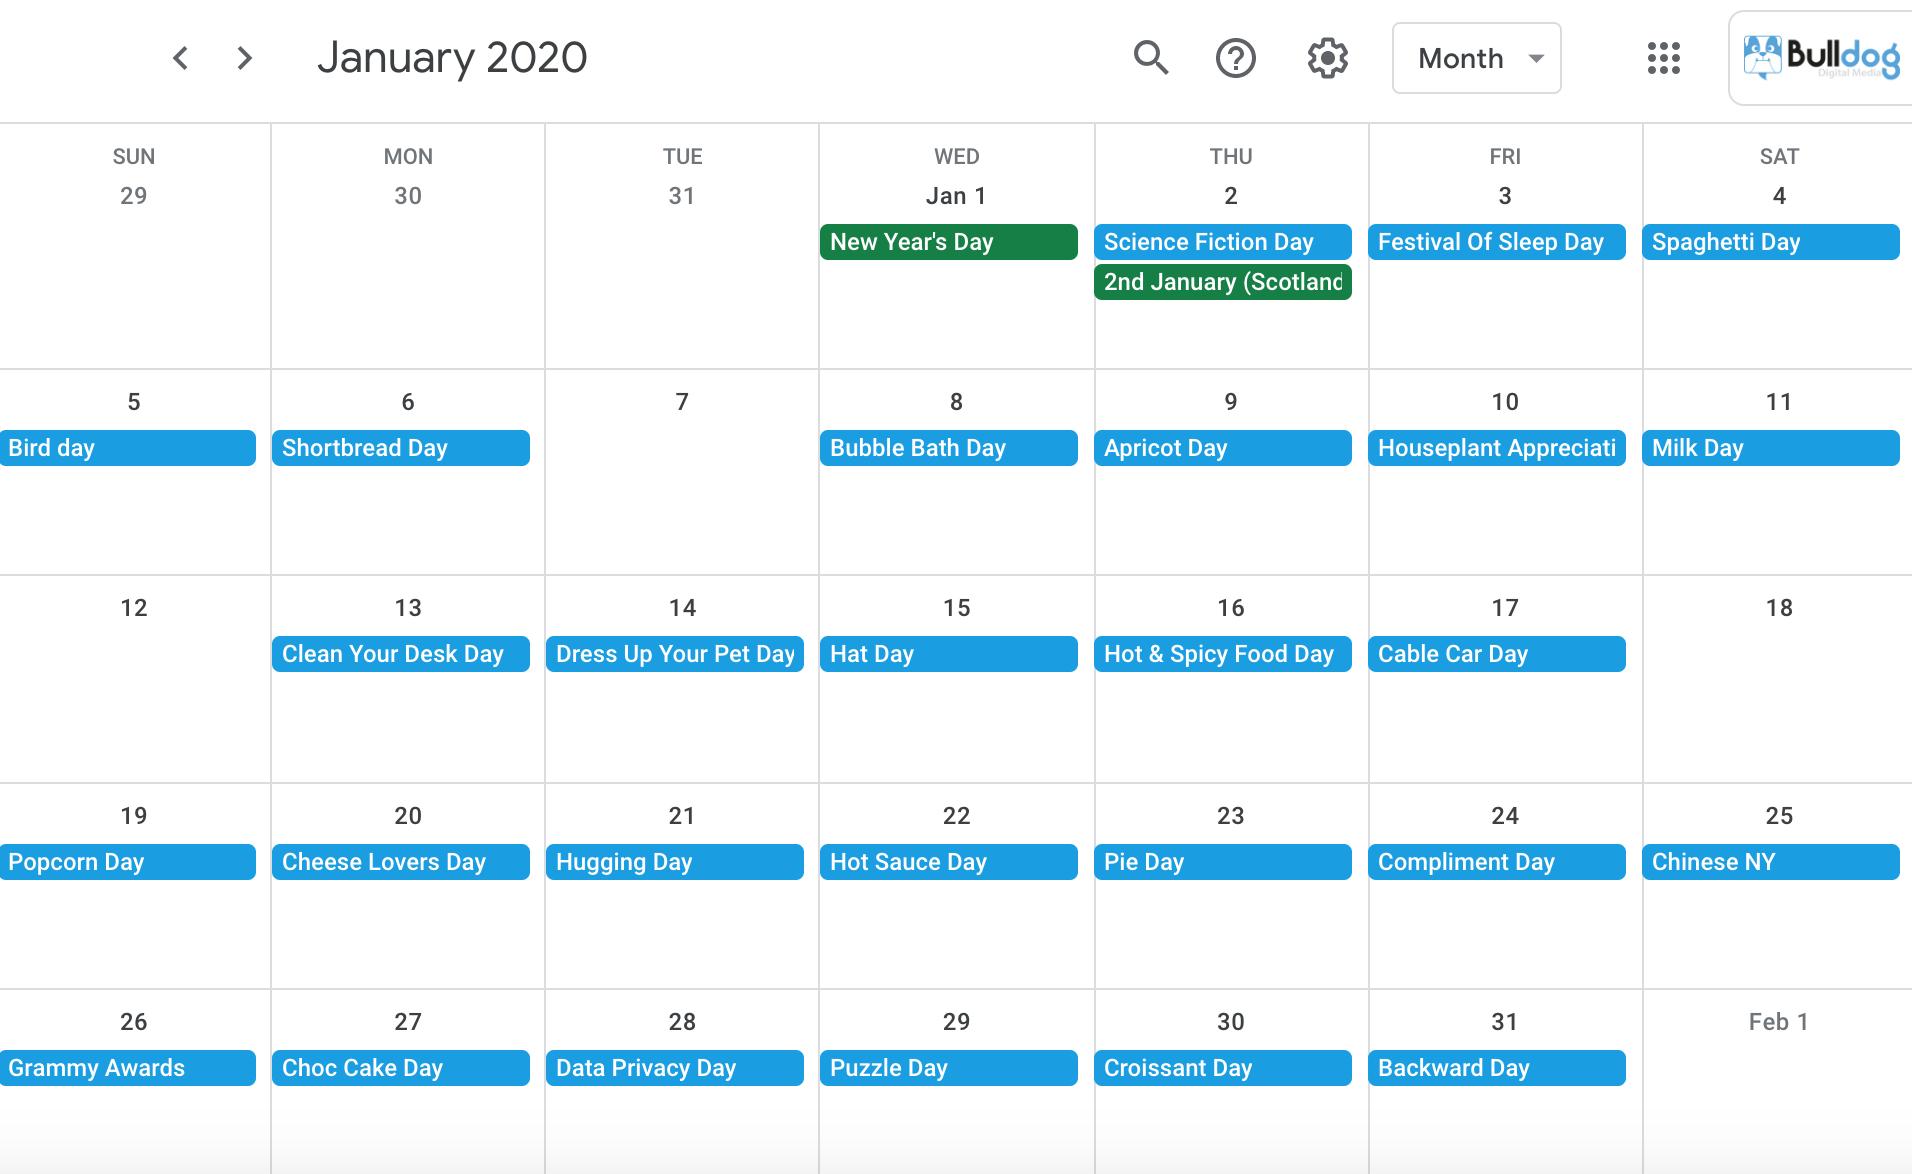 January 2020 social media holidays calendar